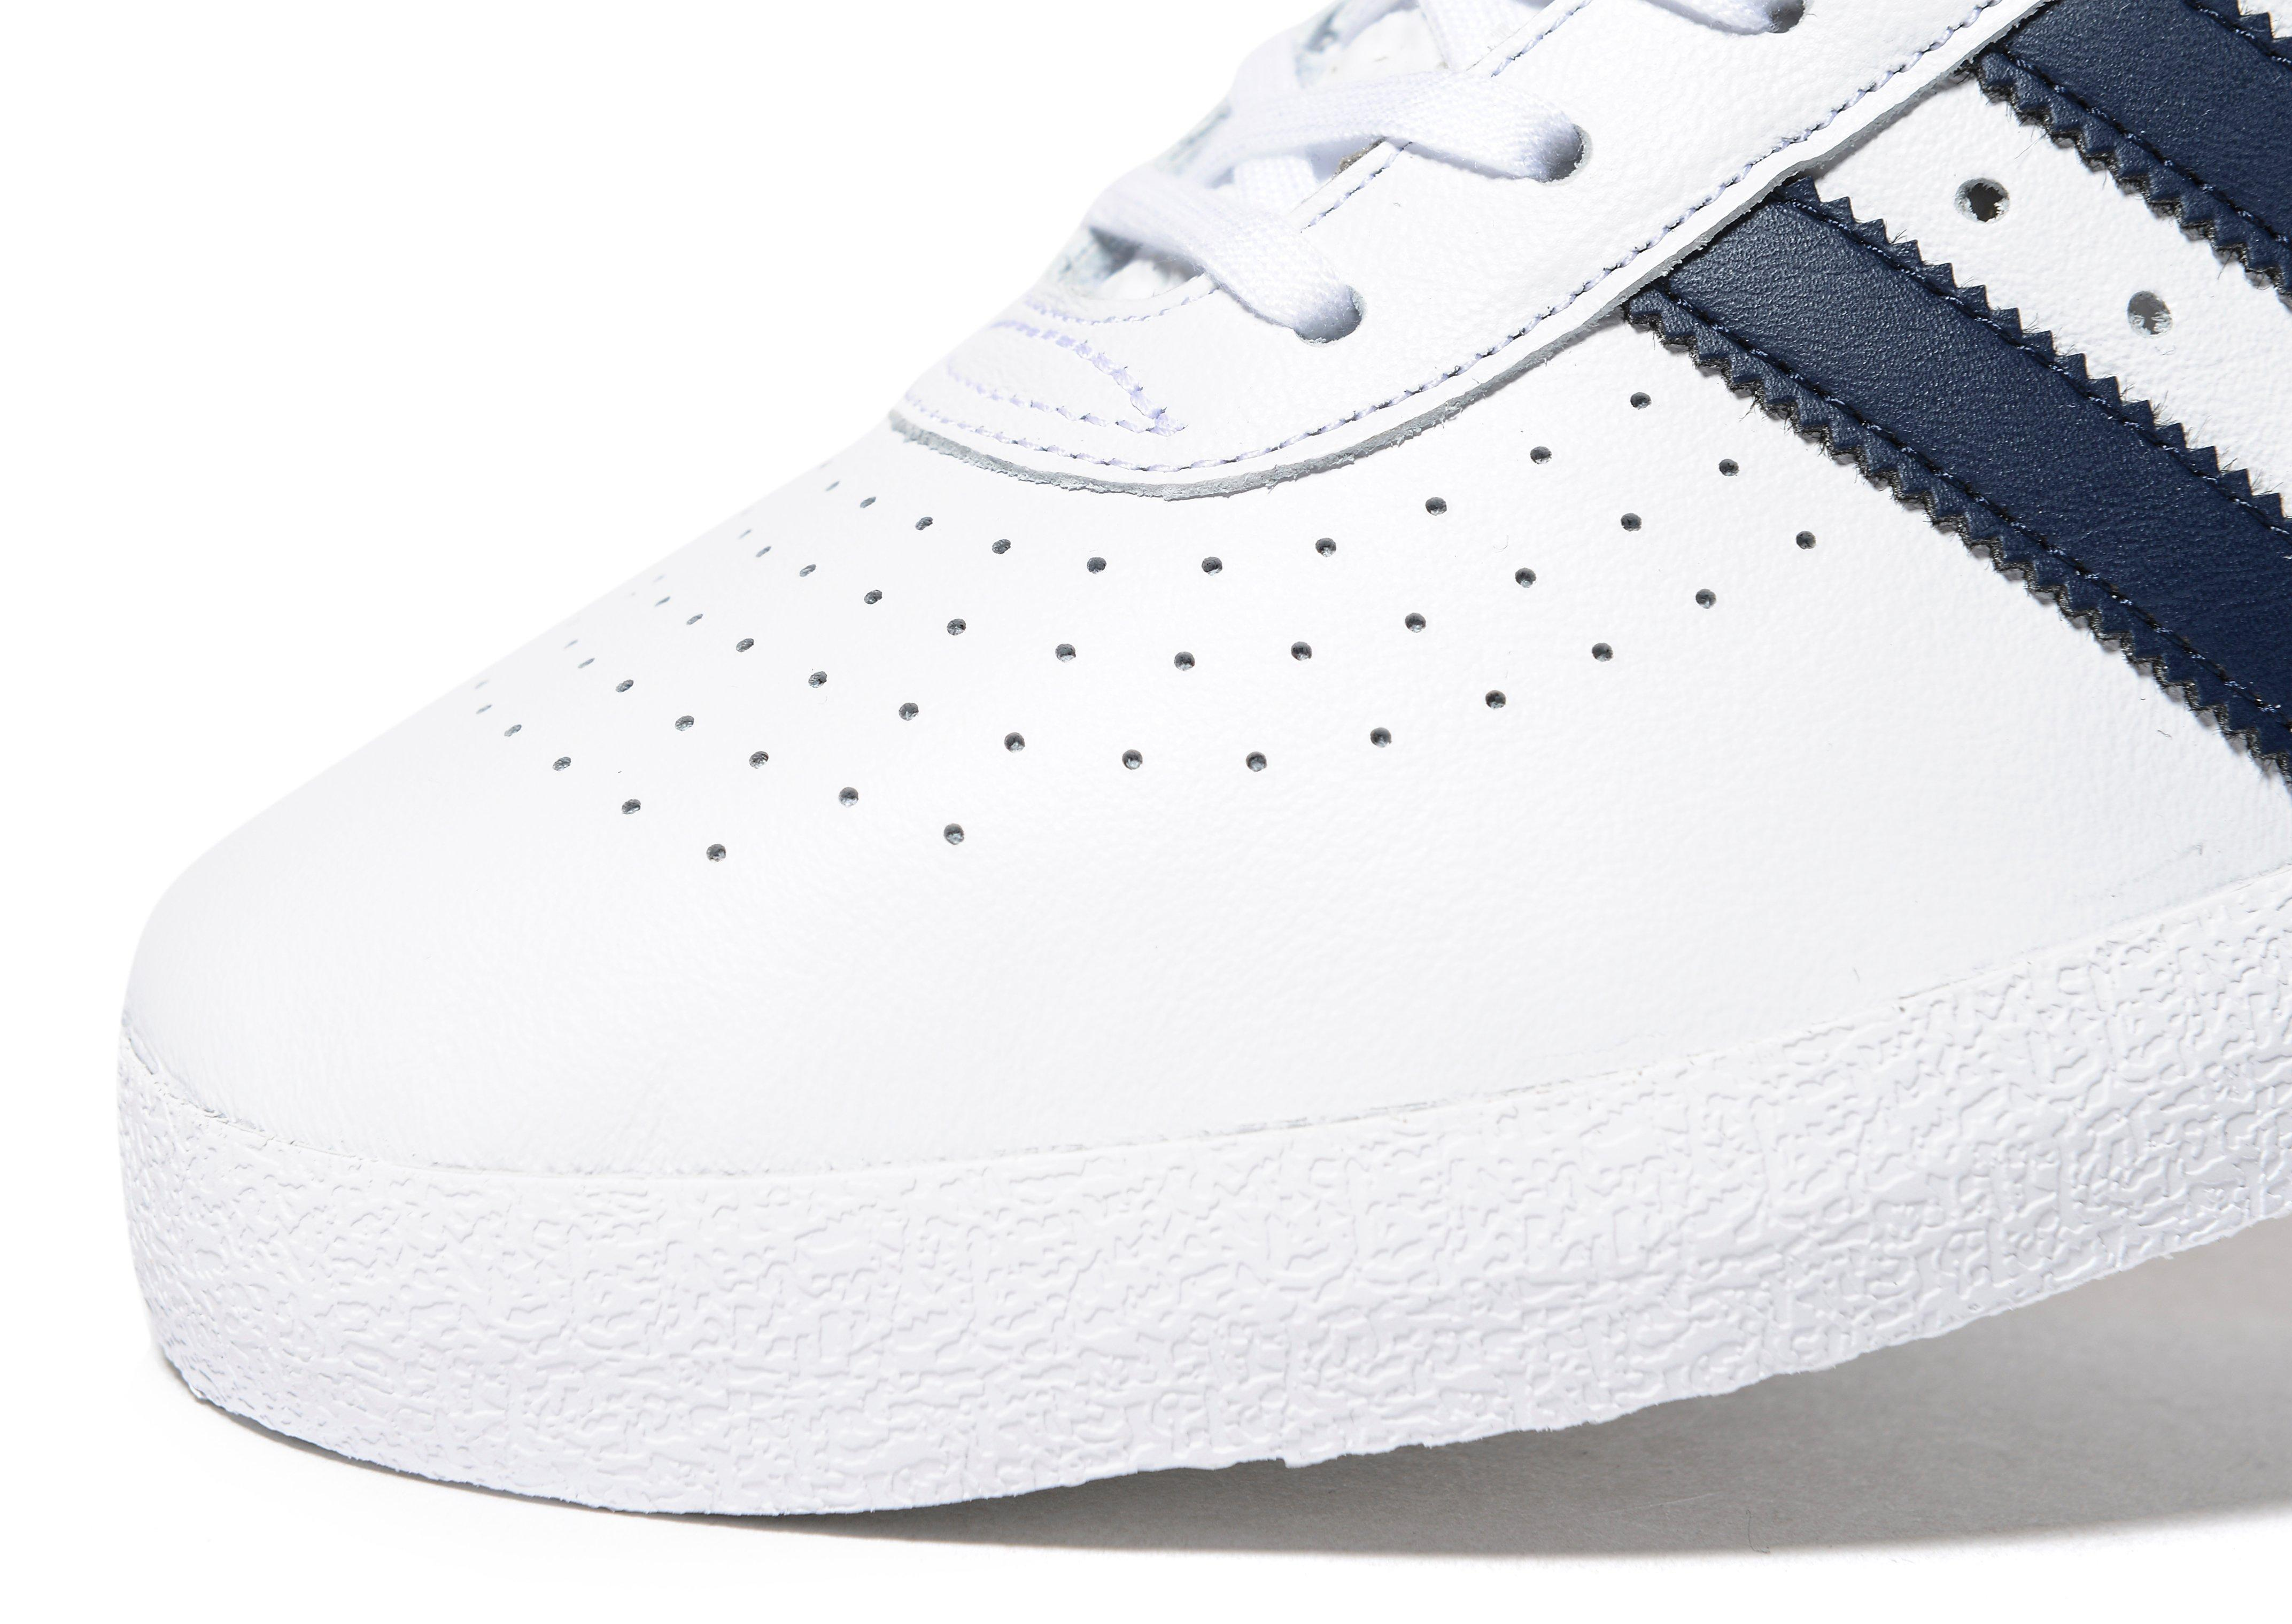 adidas 350 Leather Men's in White/Navy (Blue) for Men